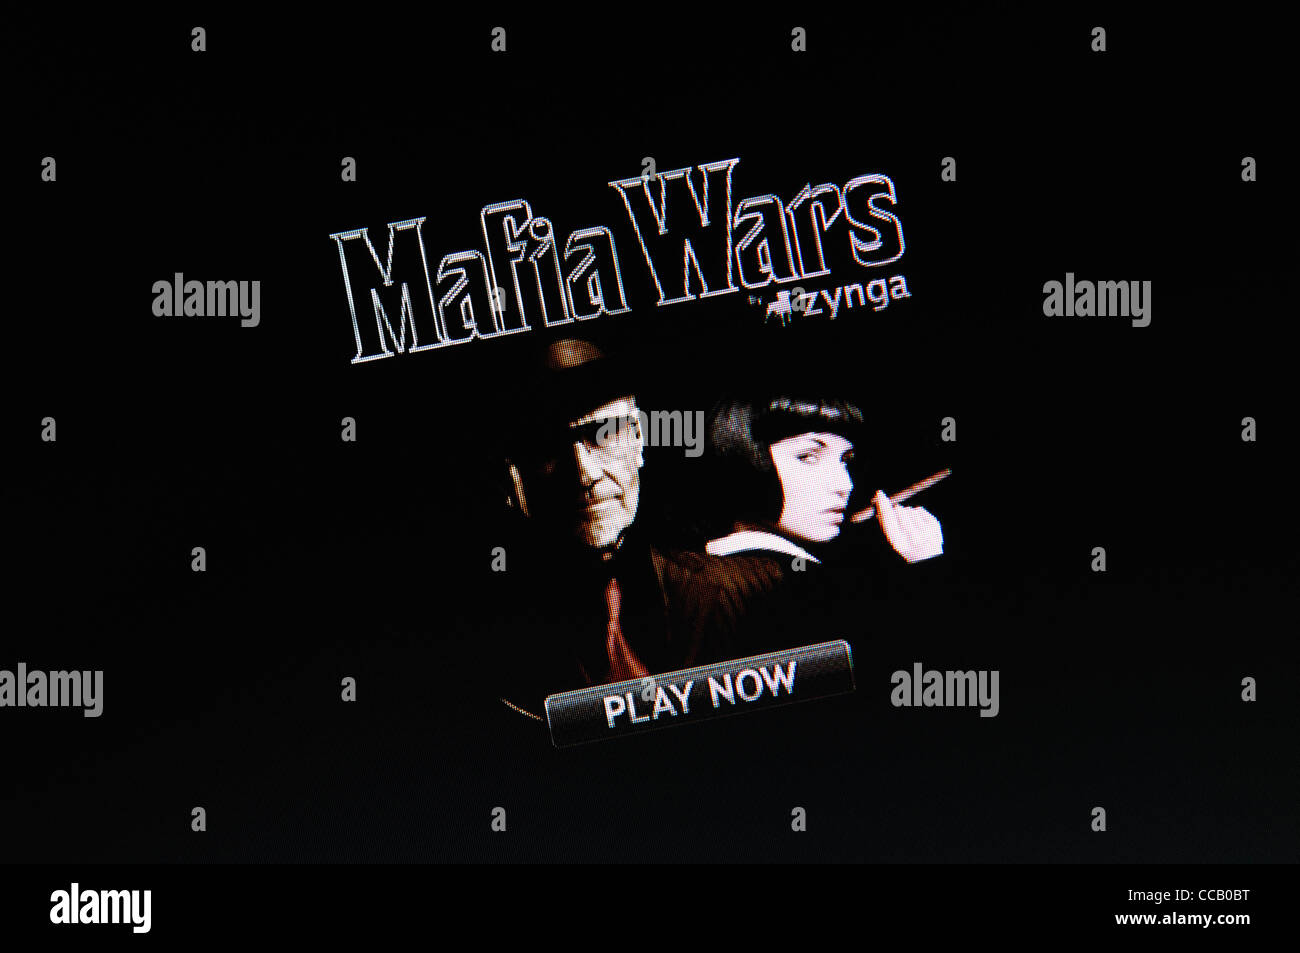 Mafia Wars Screenshot. - Stock Image